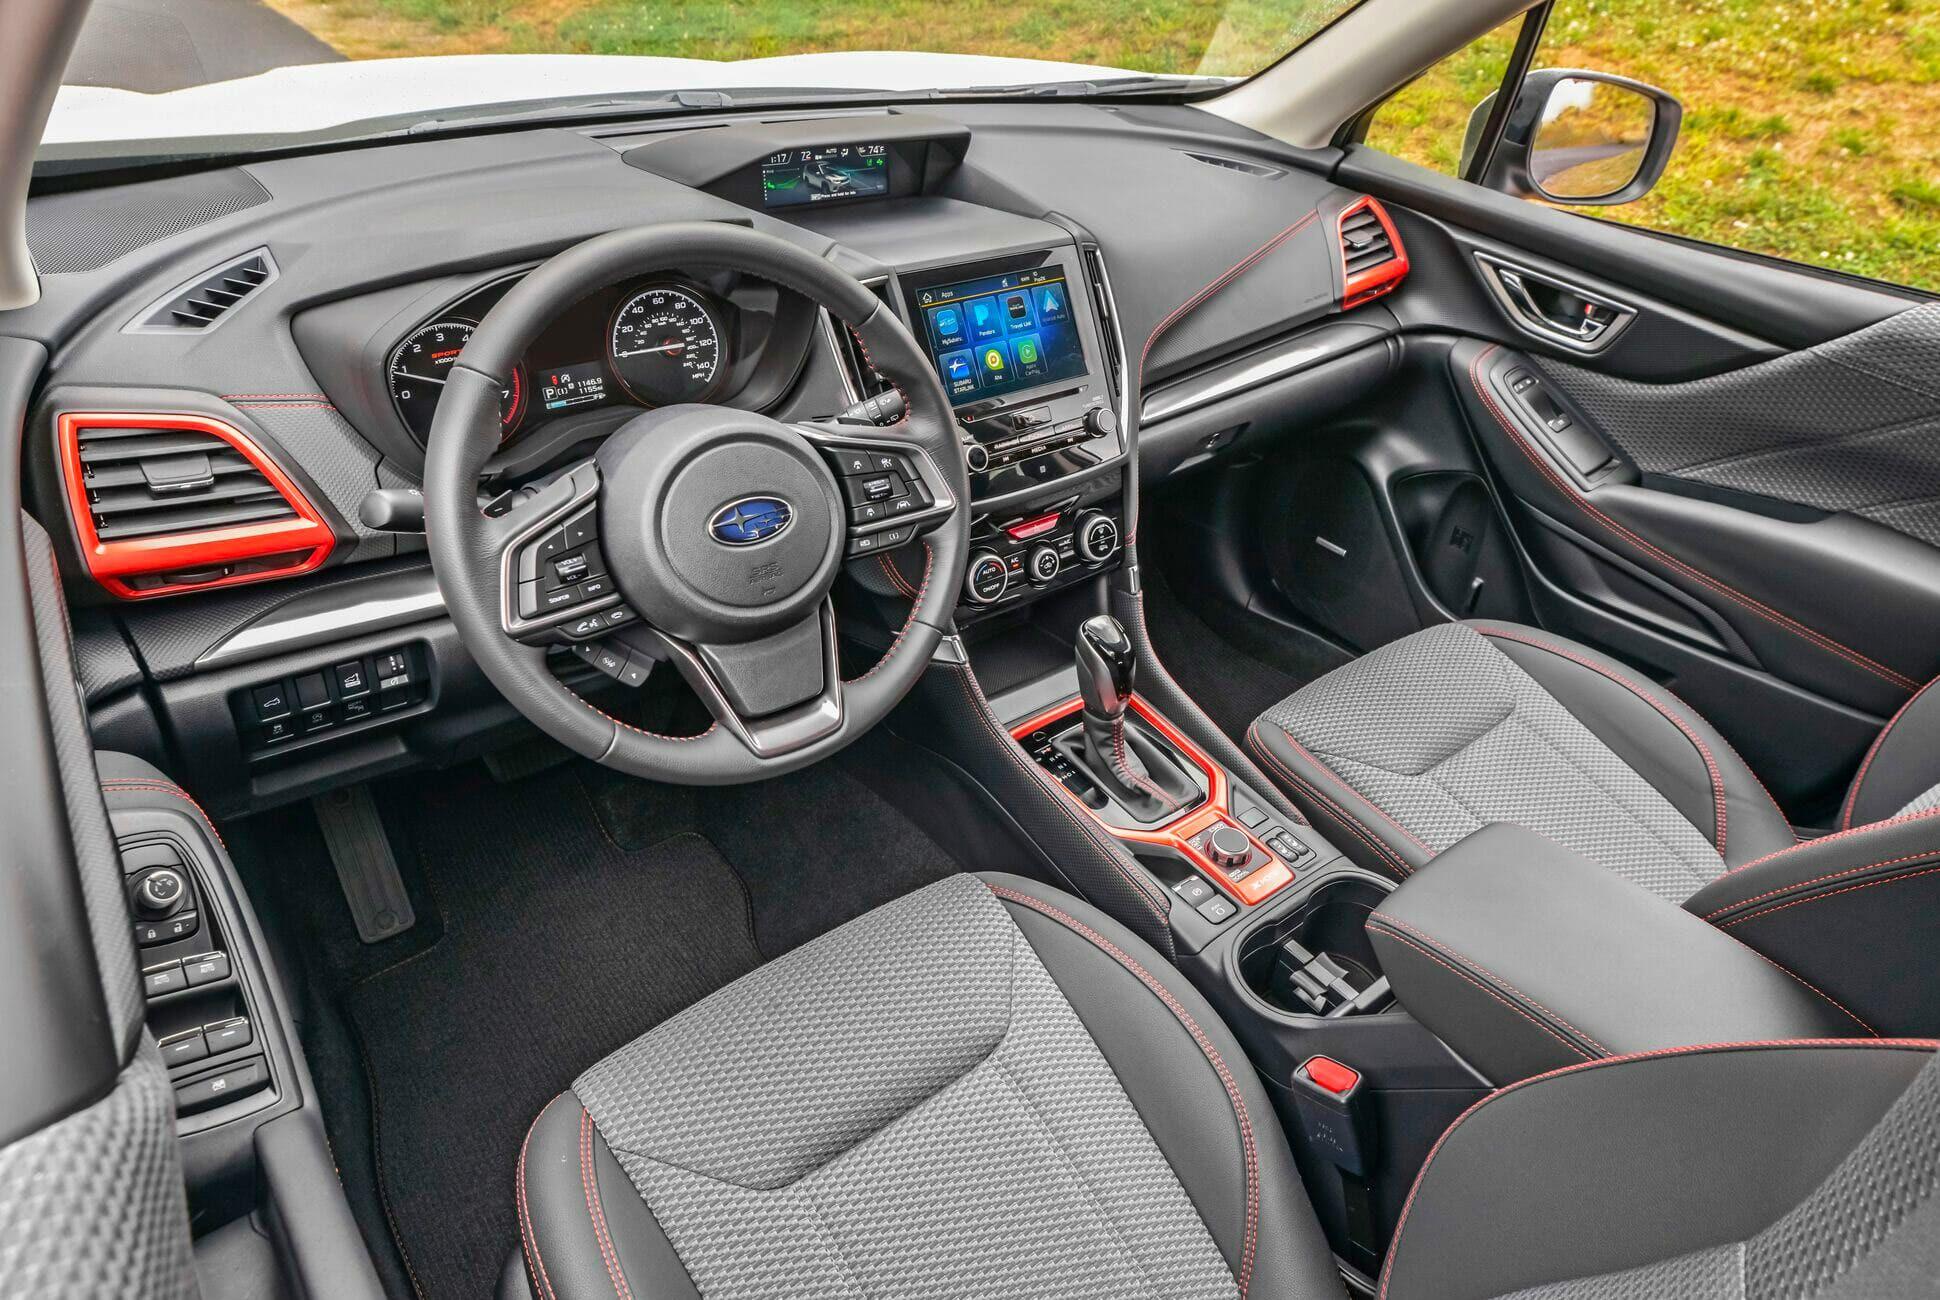 2019-Subaru-Forester-Gear-Patrol-Slide-3